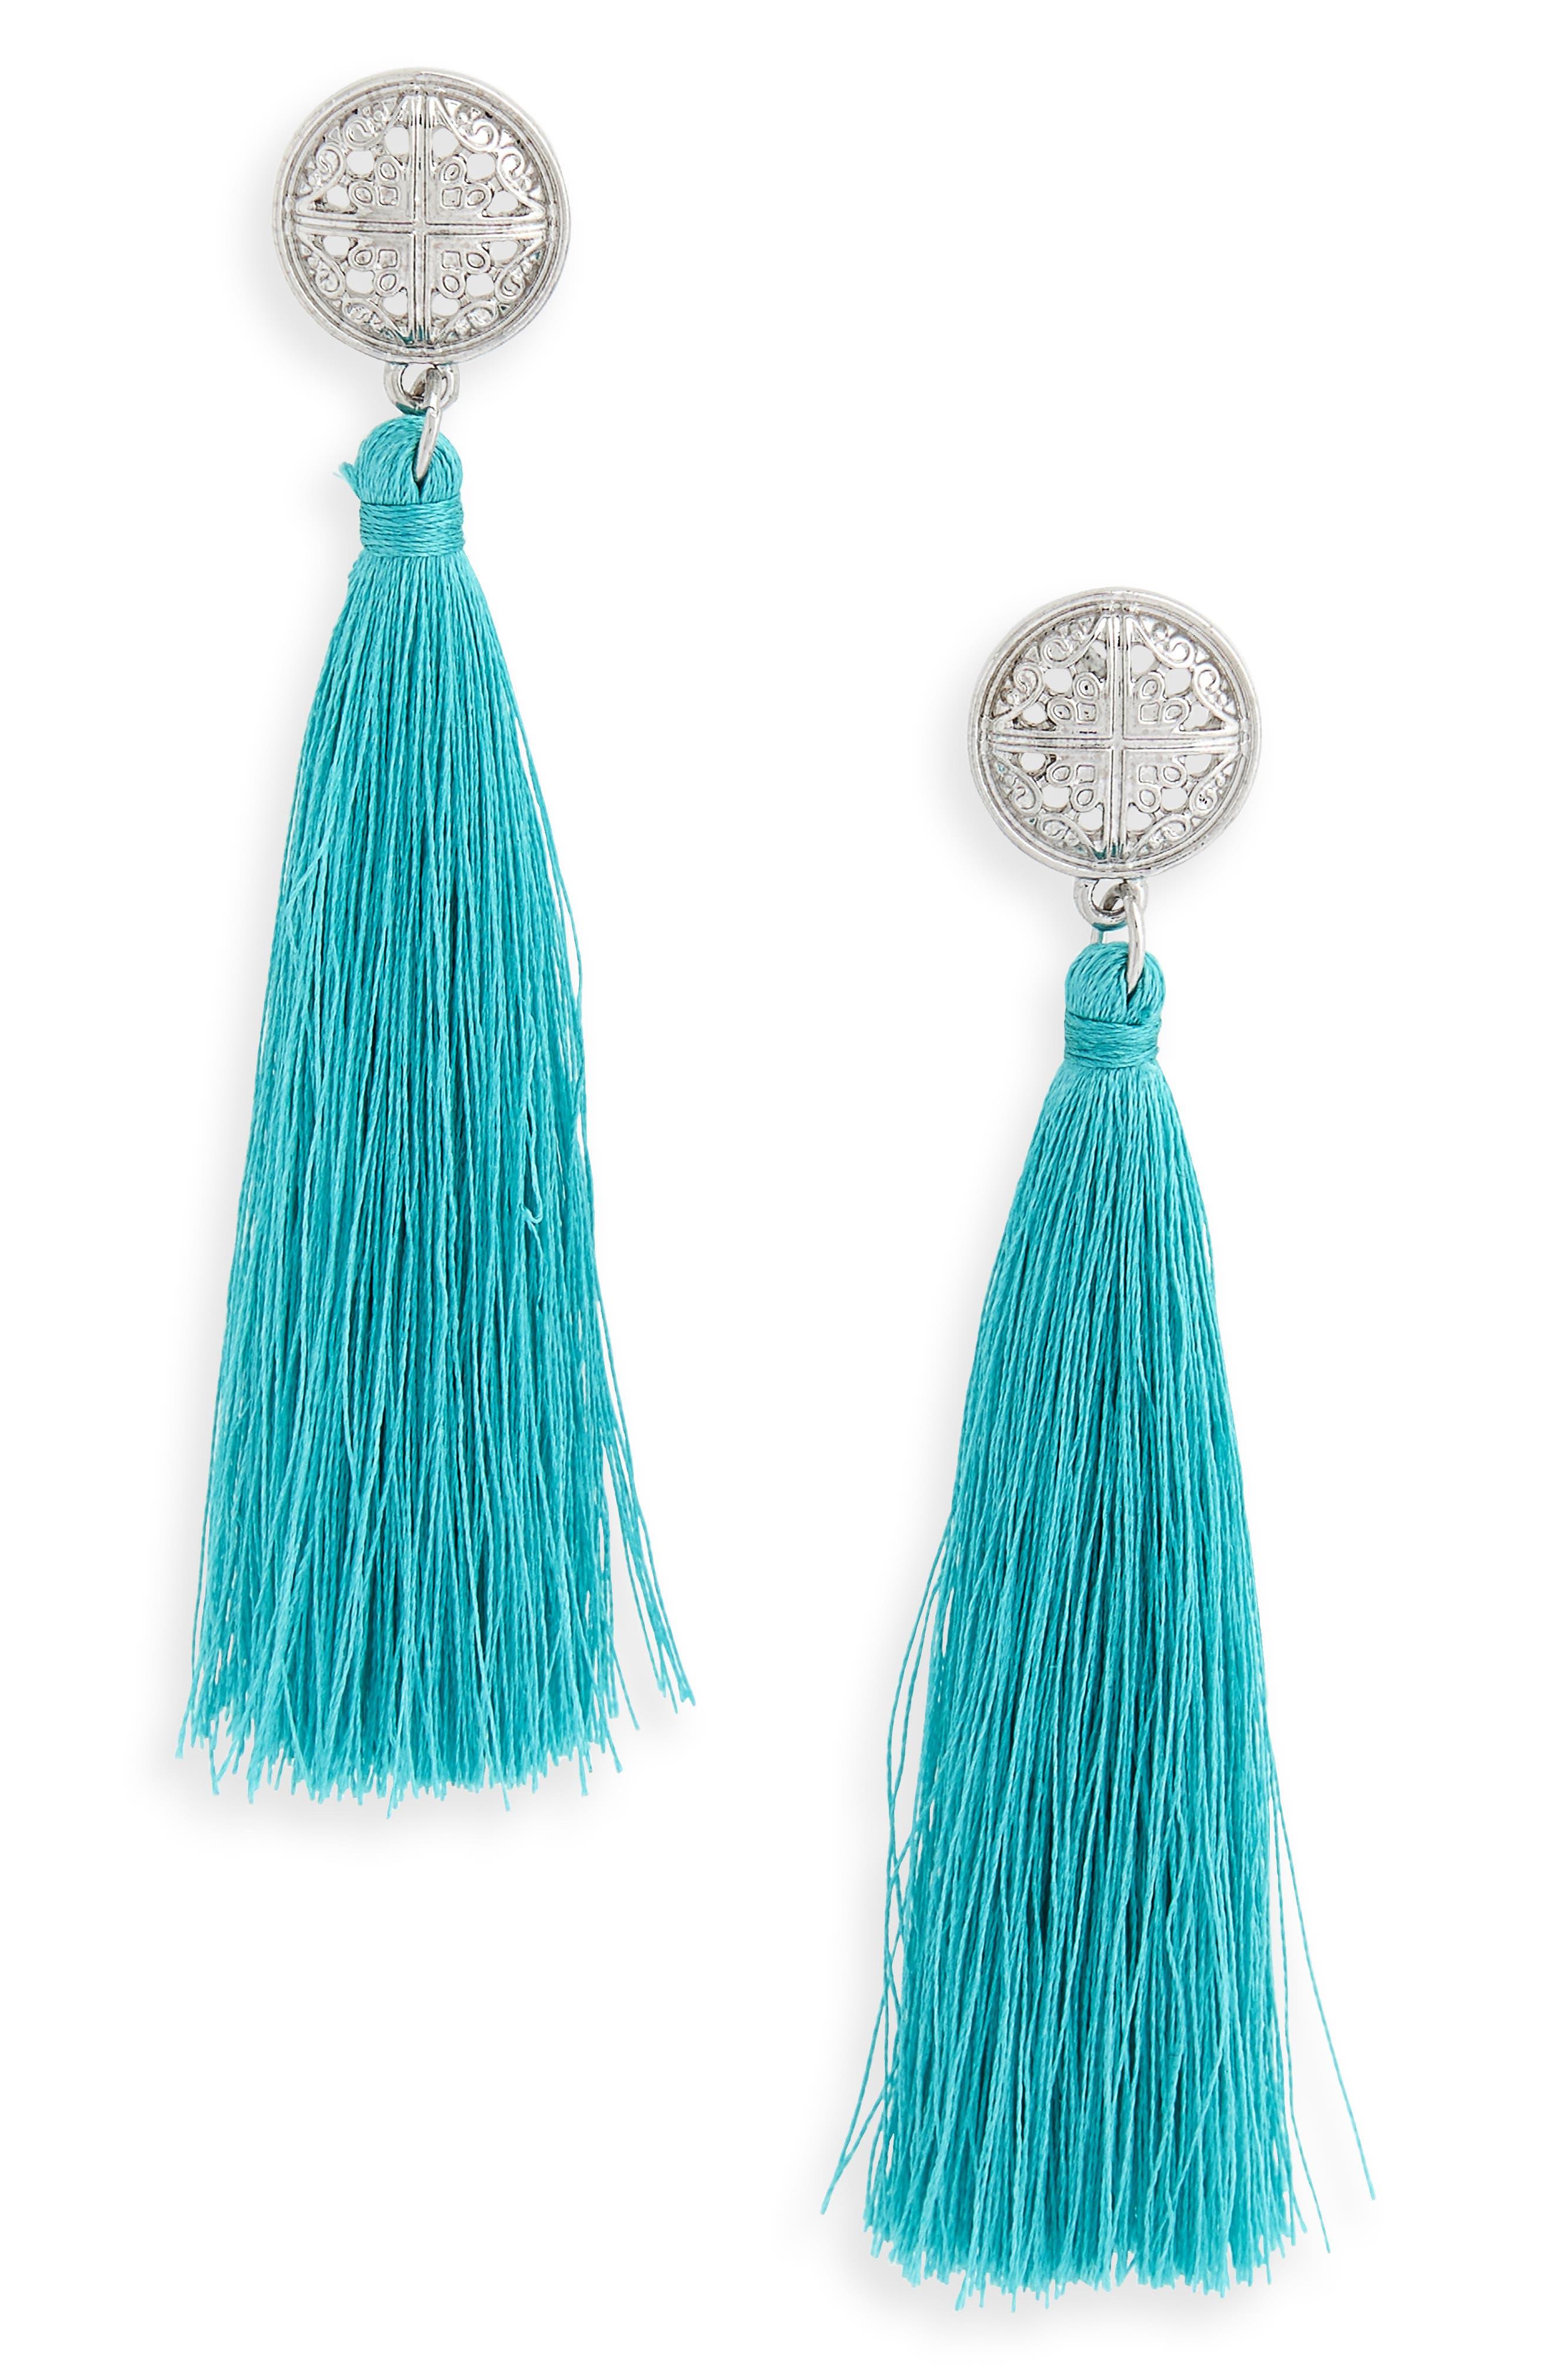 Main Image - Topshop Tassel Coin Earrings